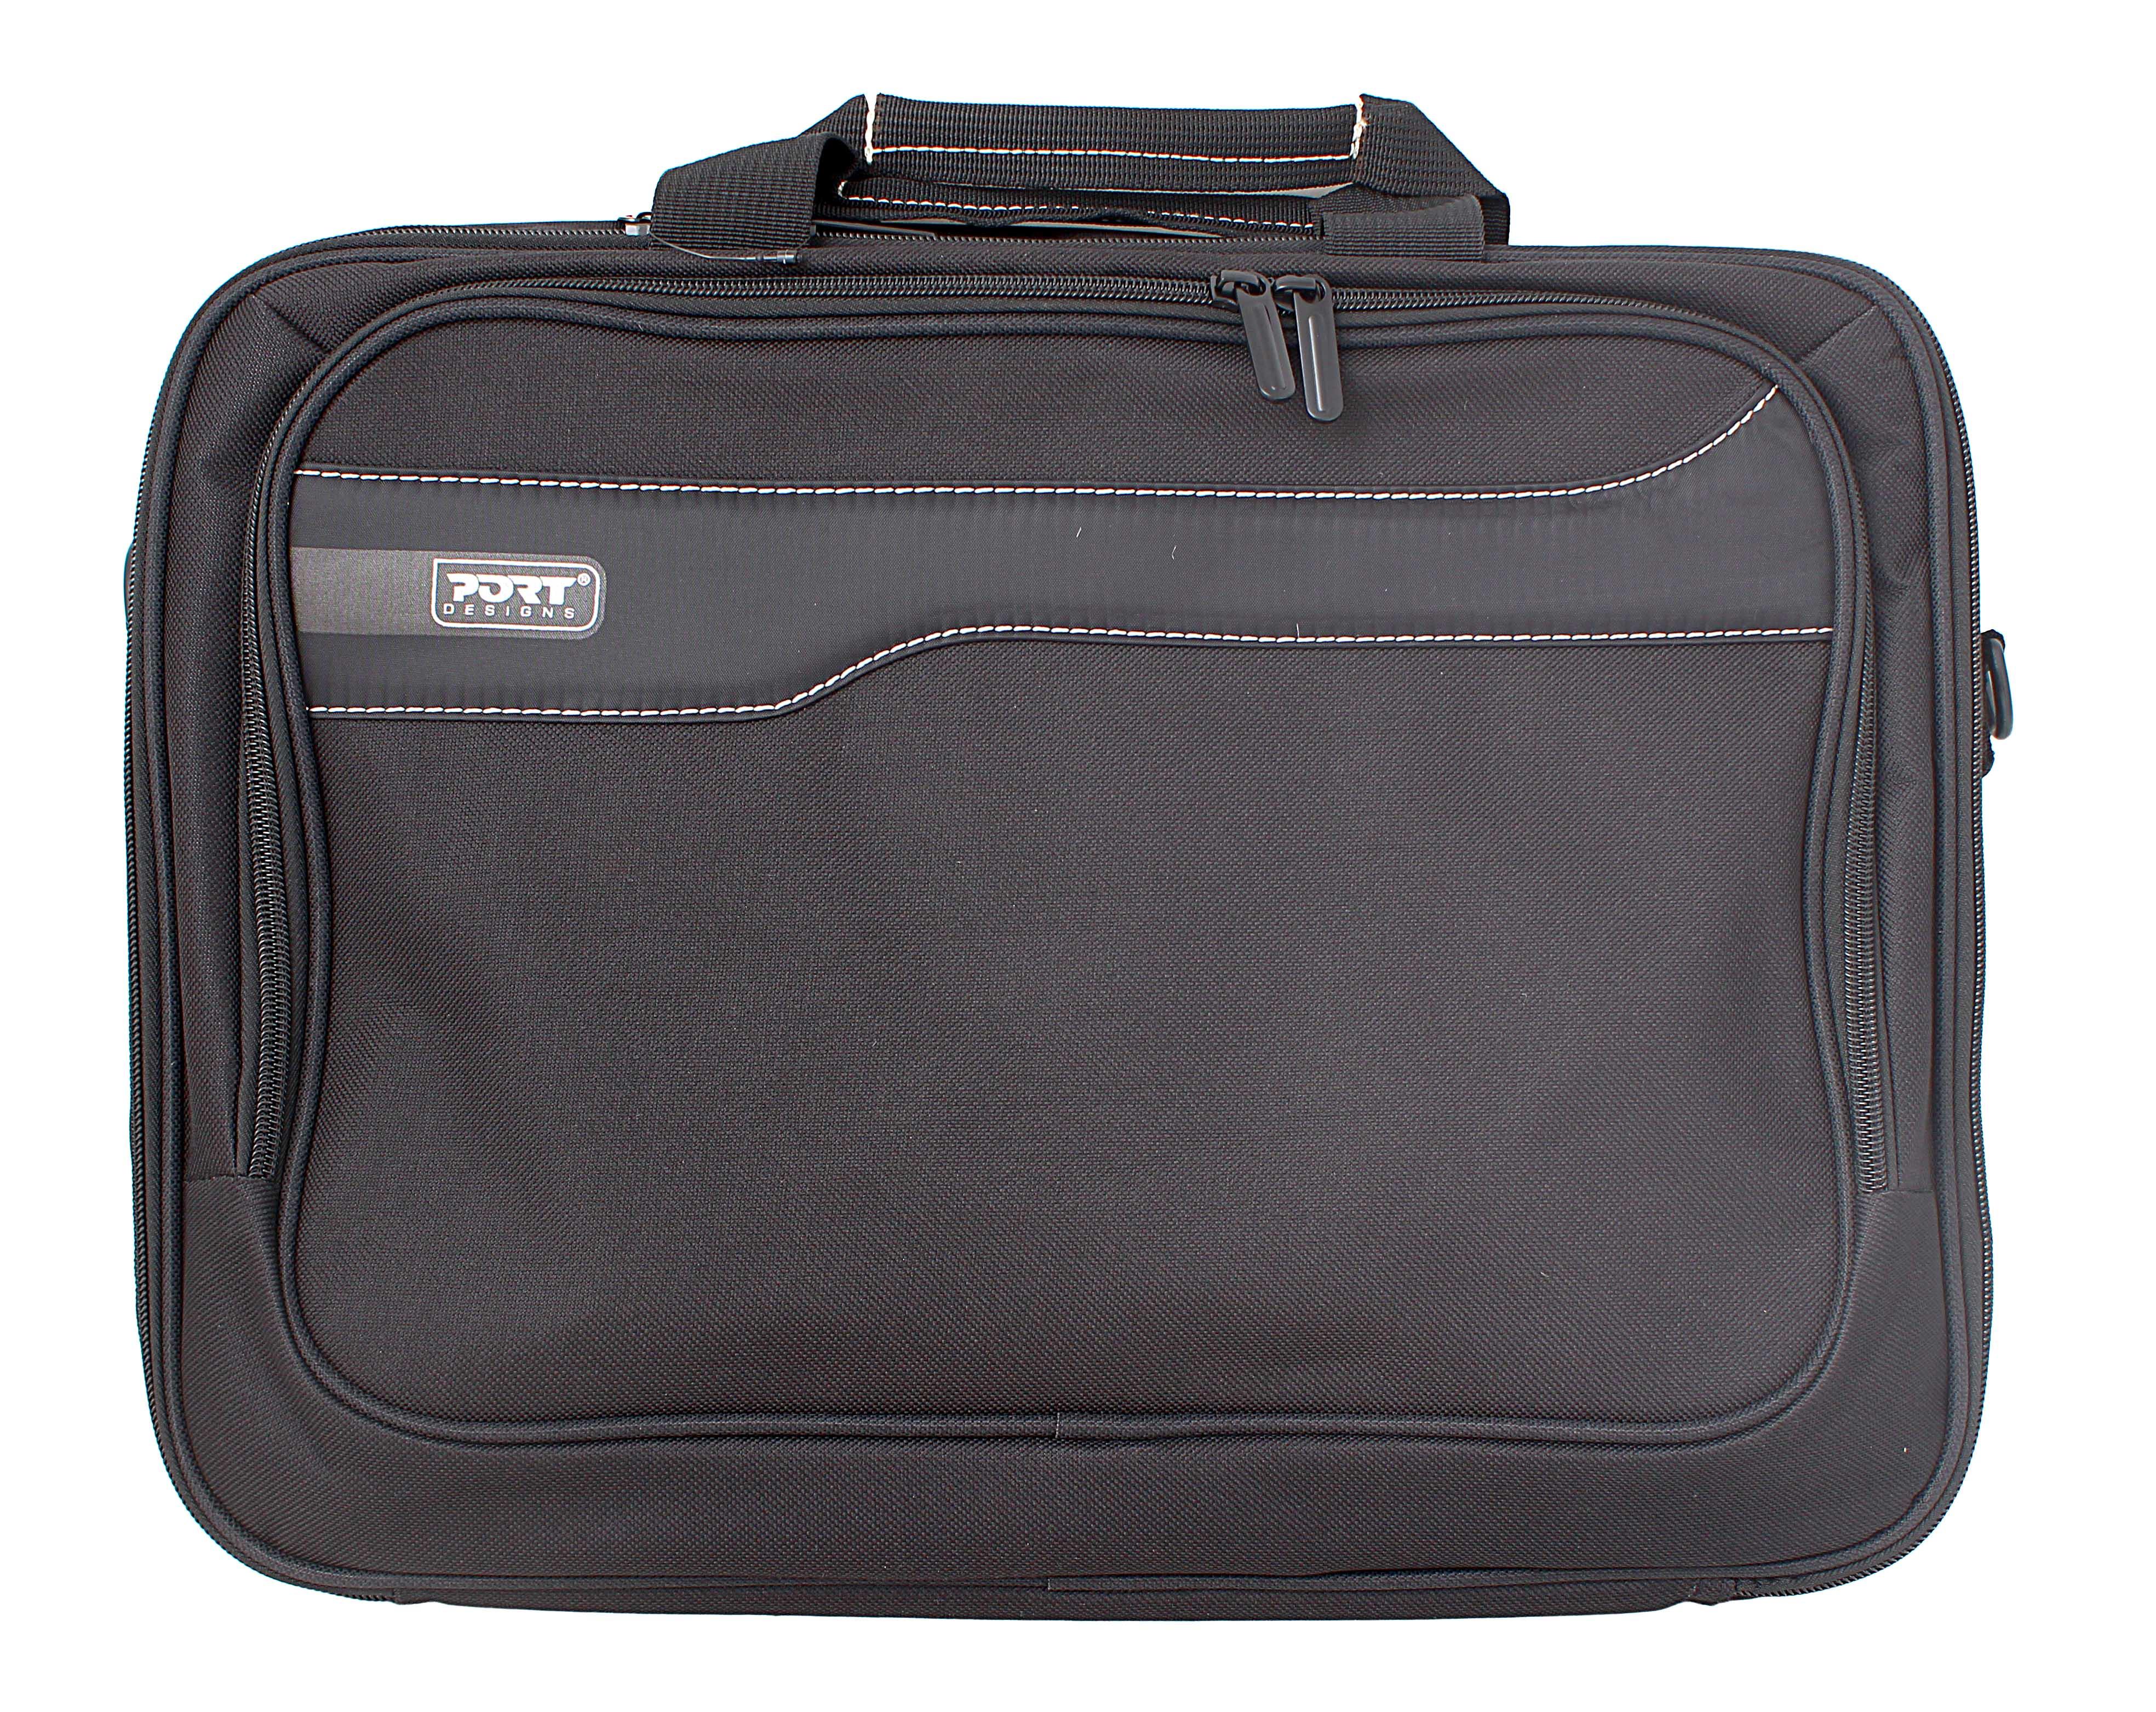 Кейс для ноутбука Portdesigns Real Brand Technics 854.000